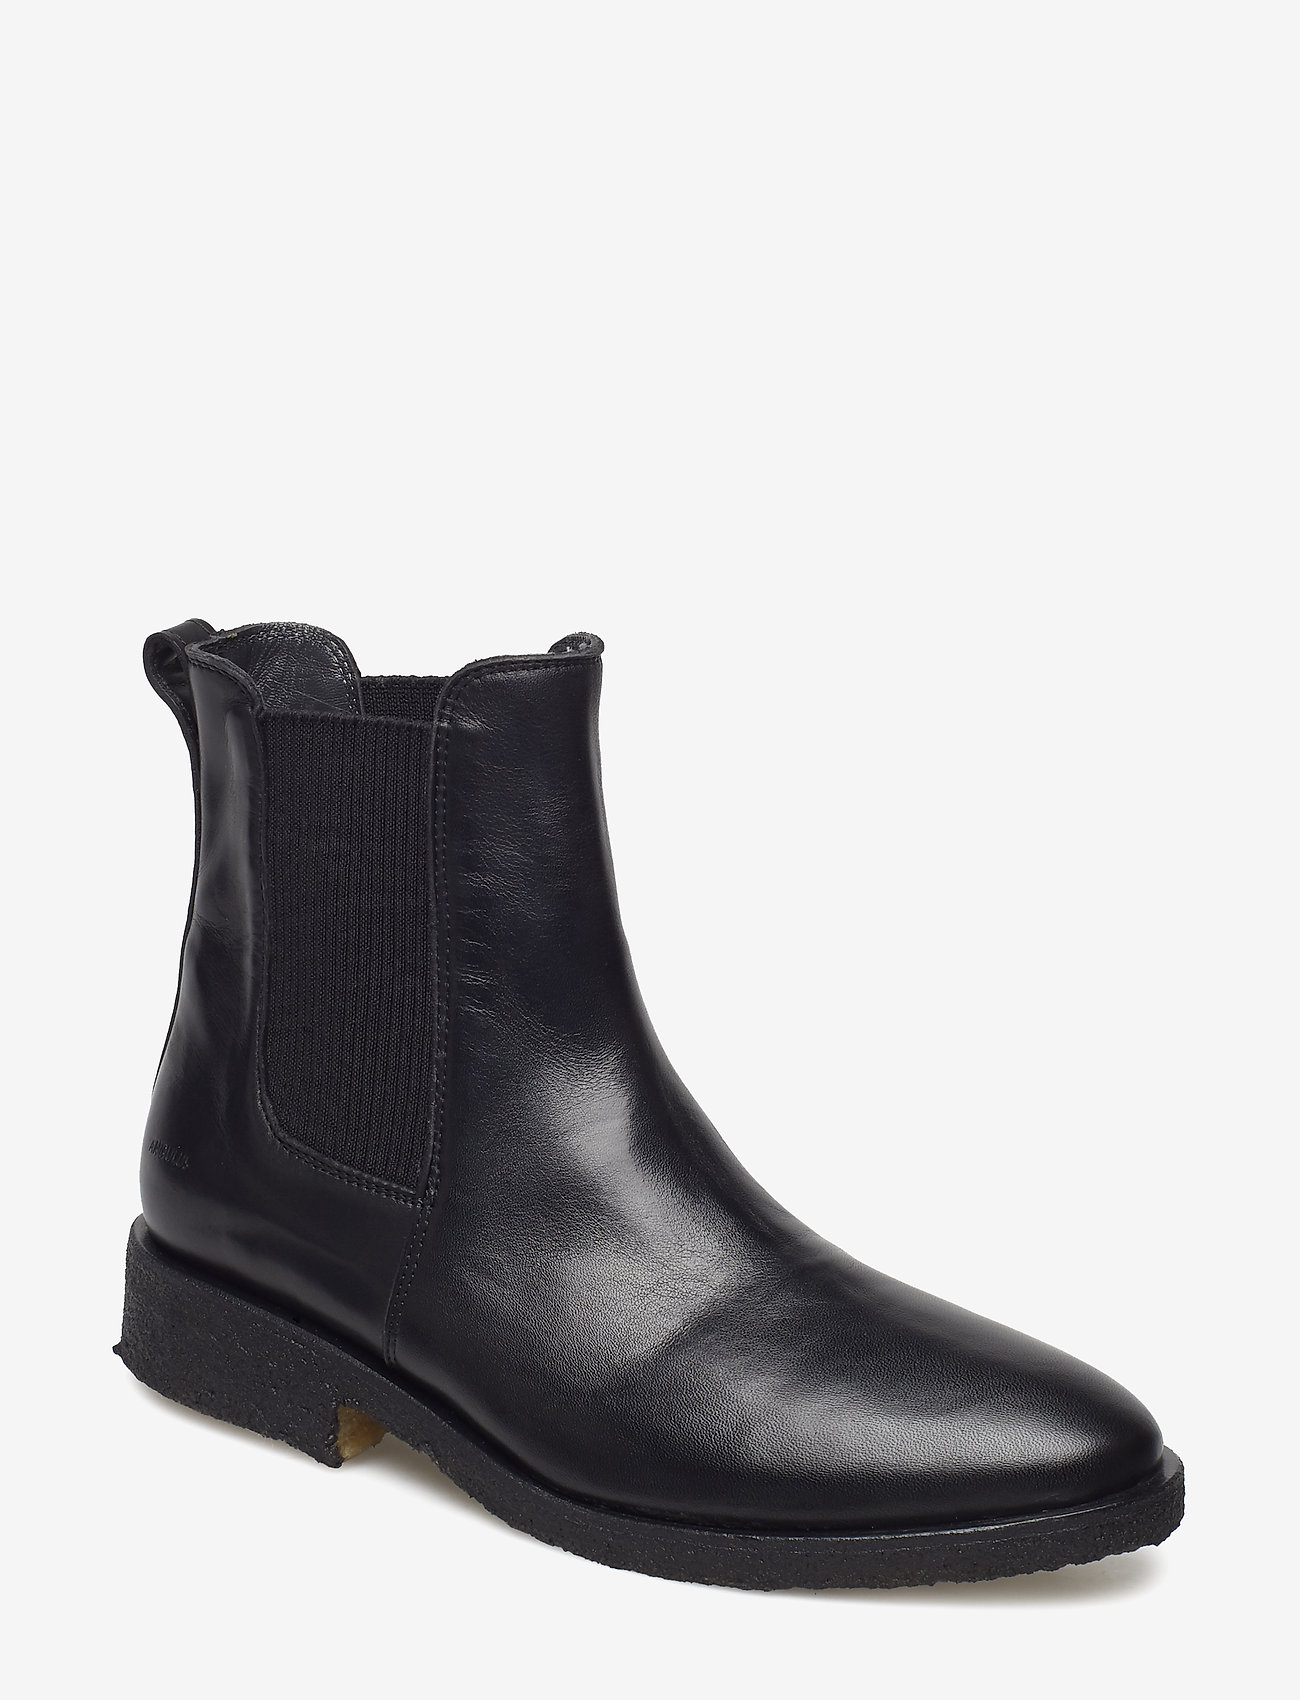 ANGULUS - Booties - flat - with elastic - stiefel - 1604/019 black/black - 0